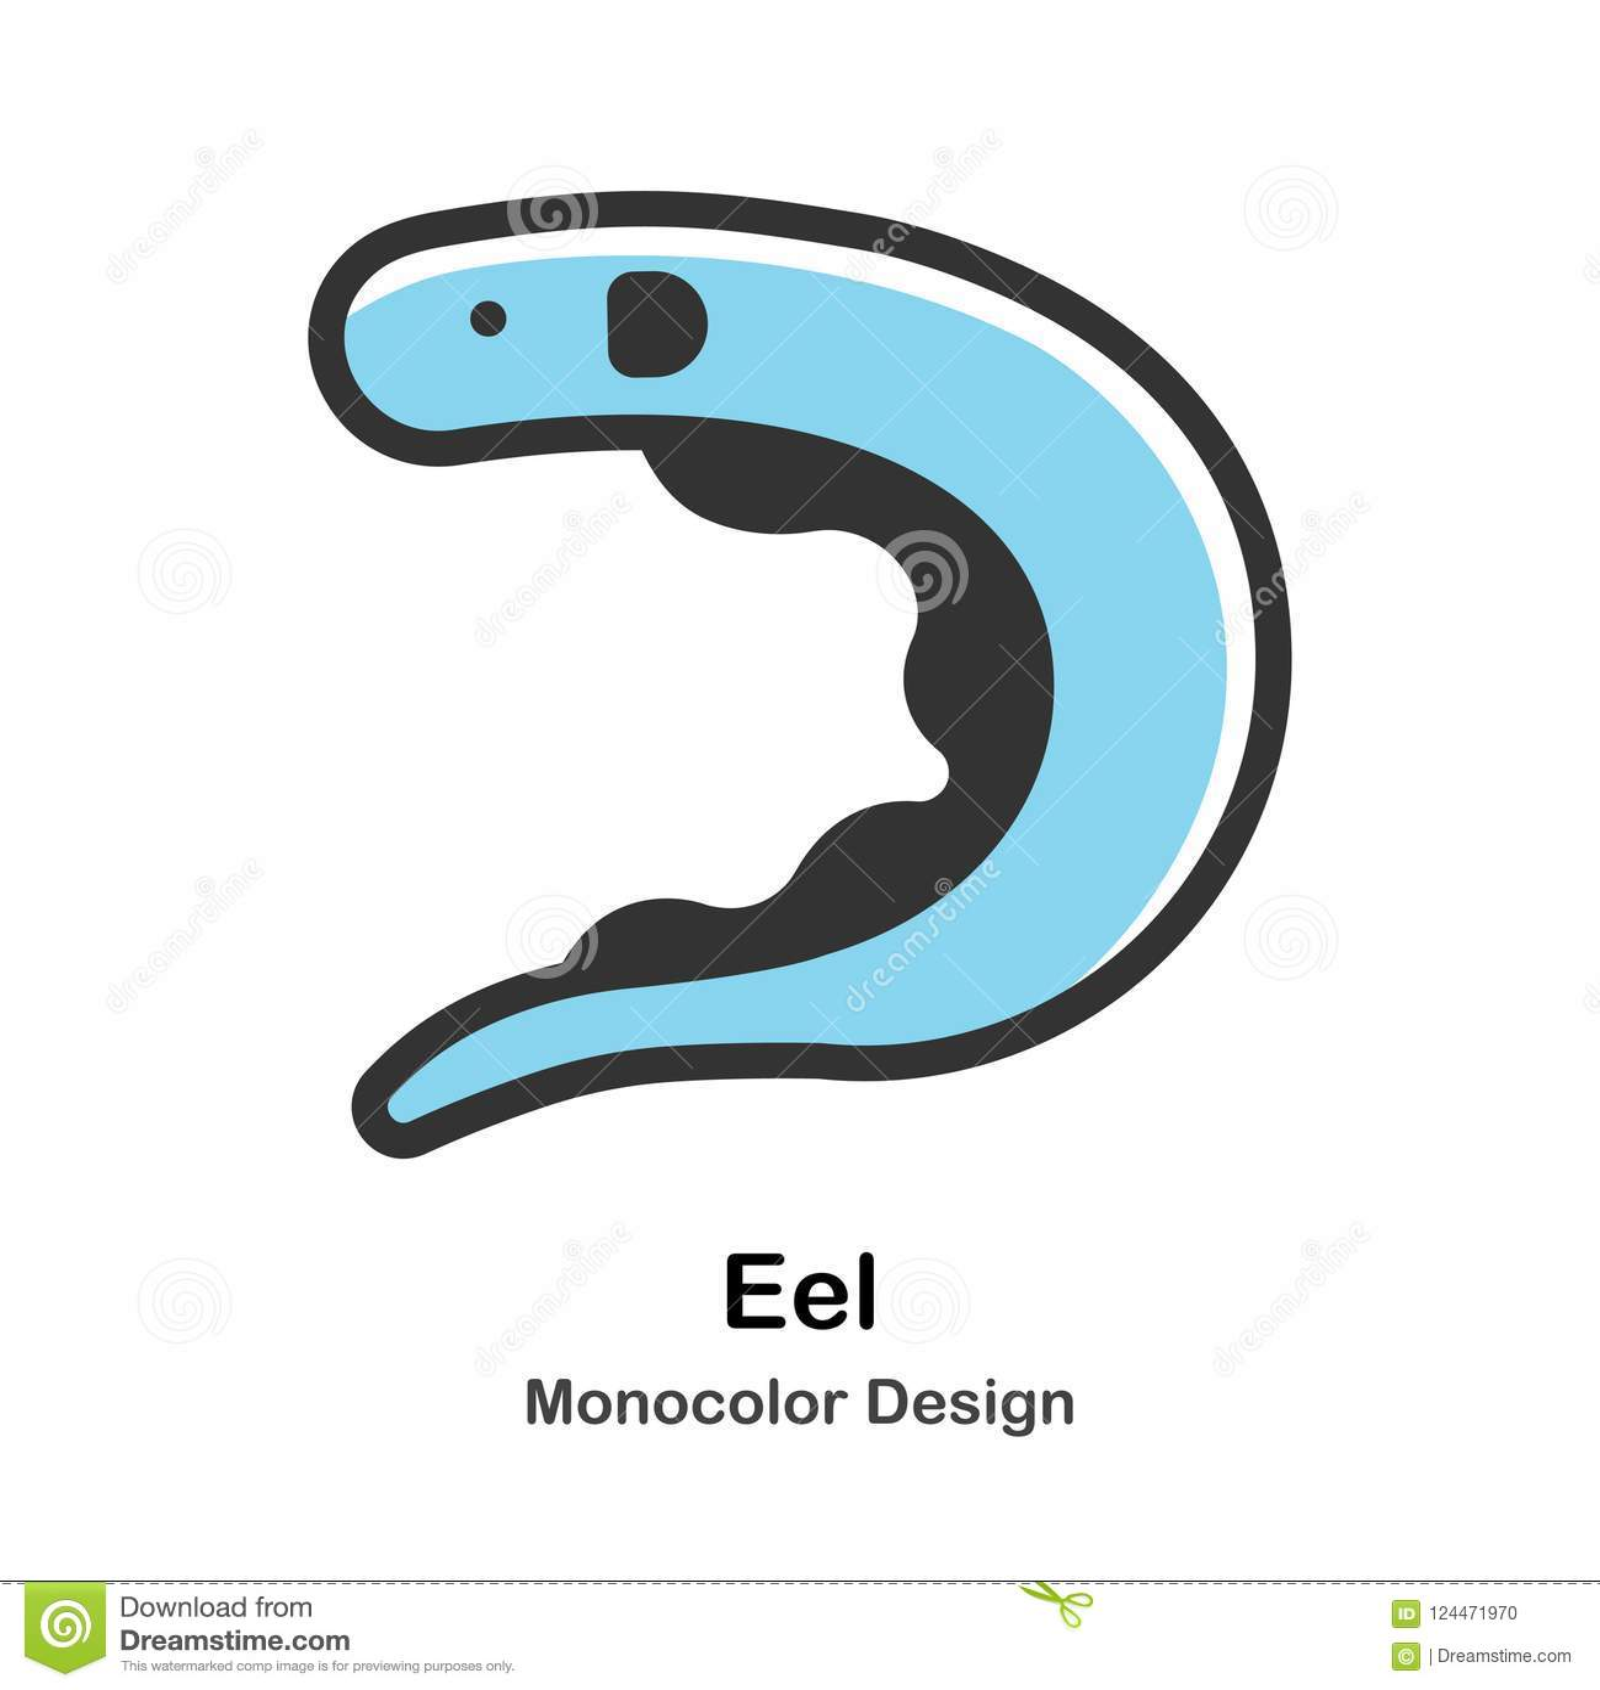 hight resolution of eel monocolor illustration